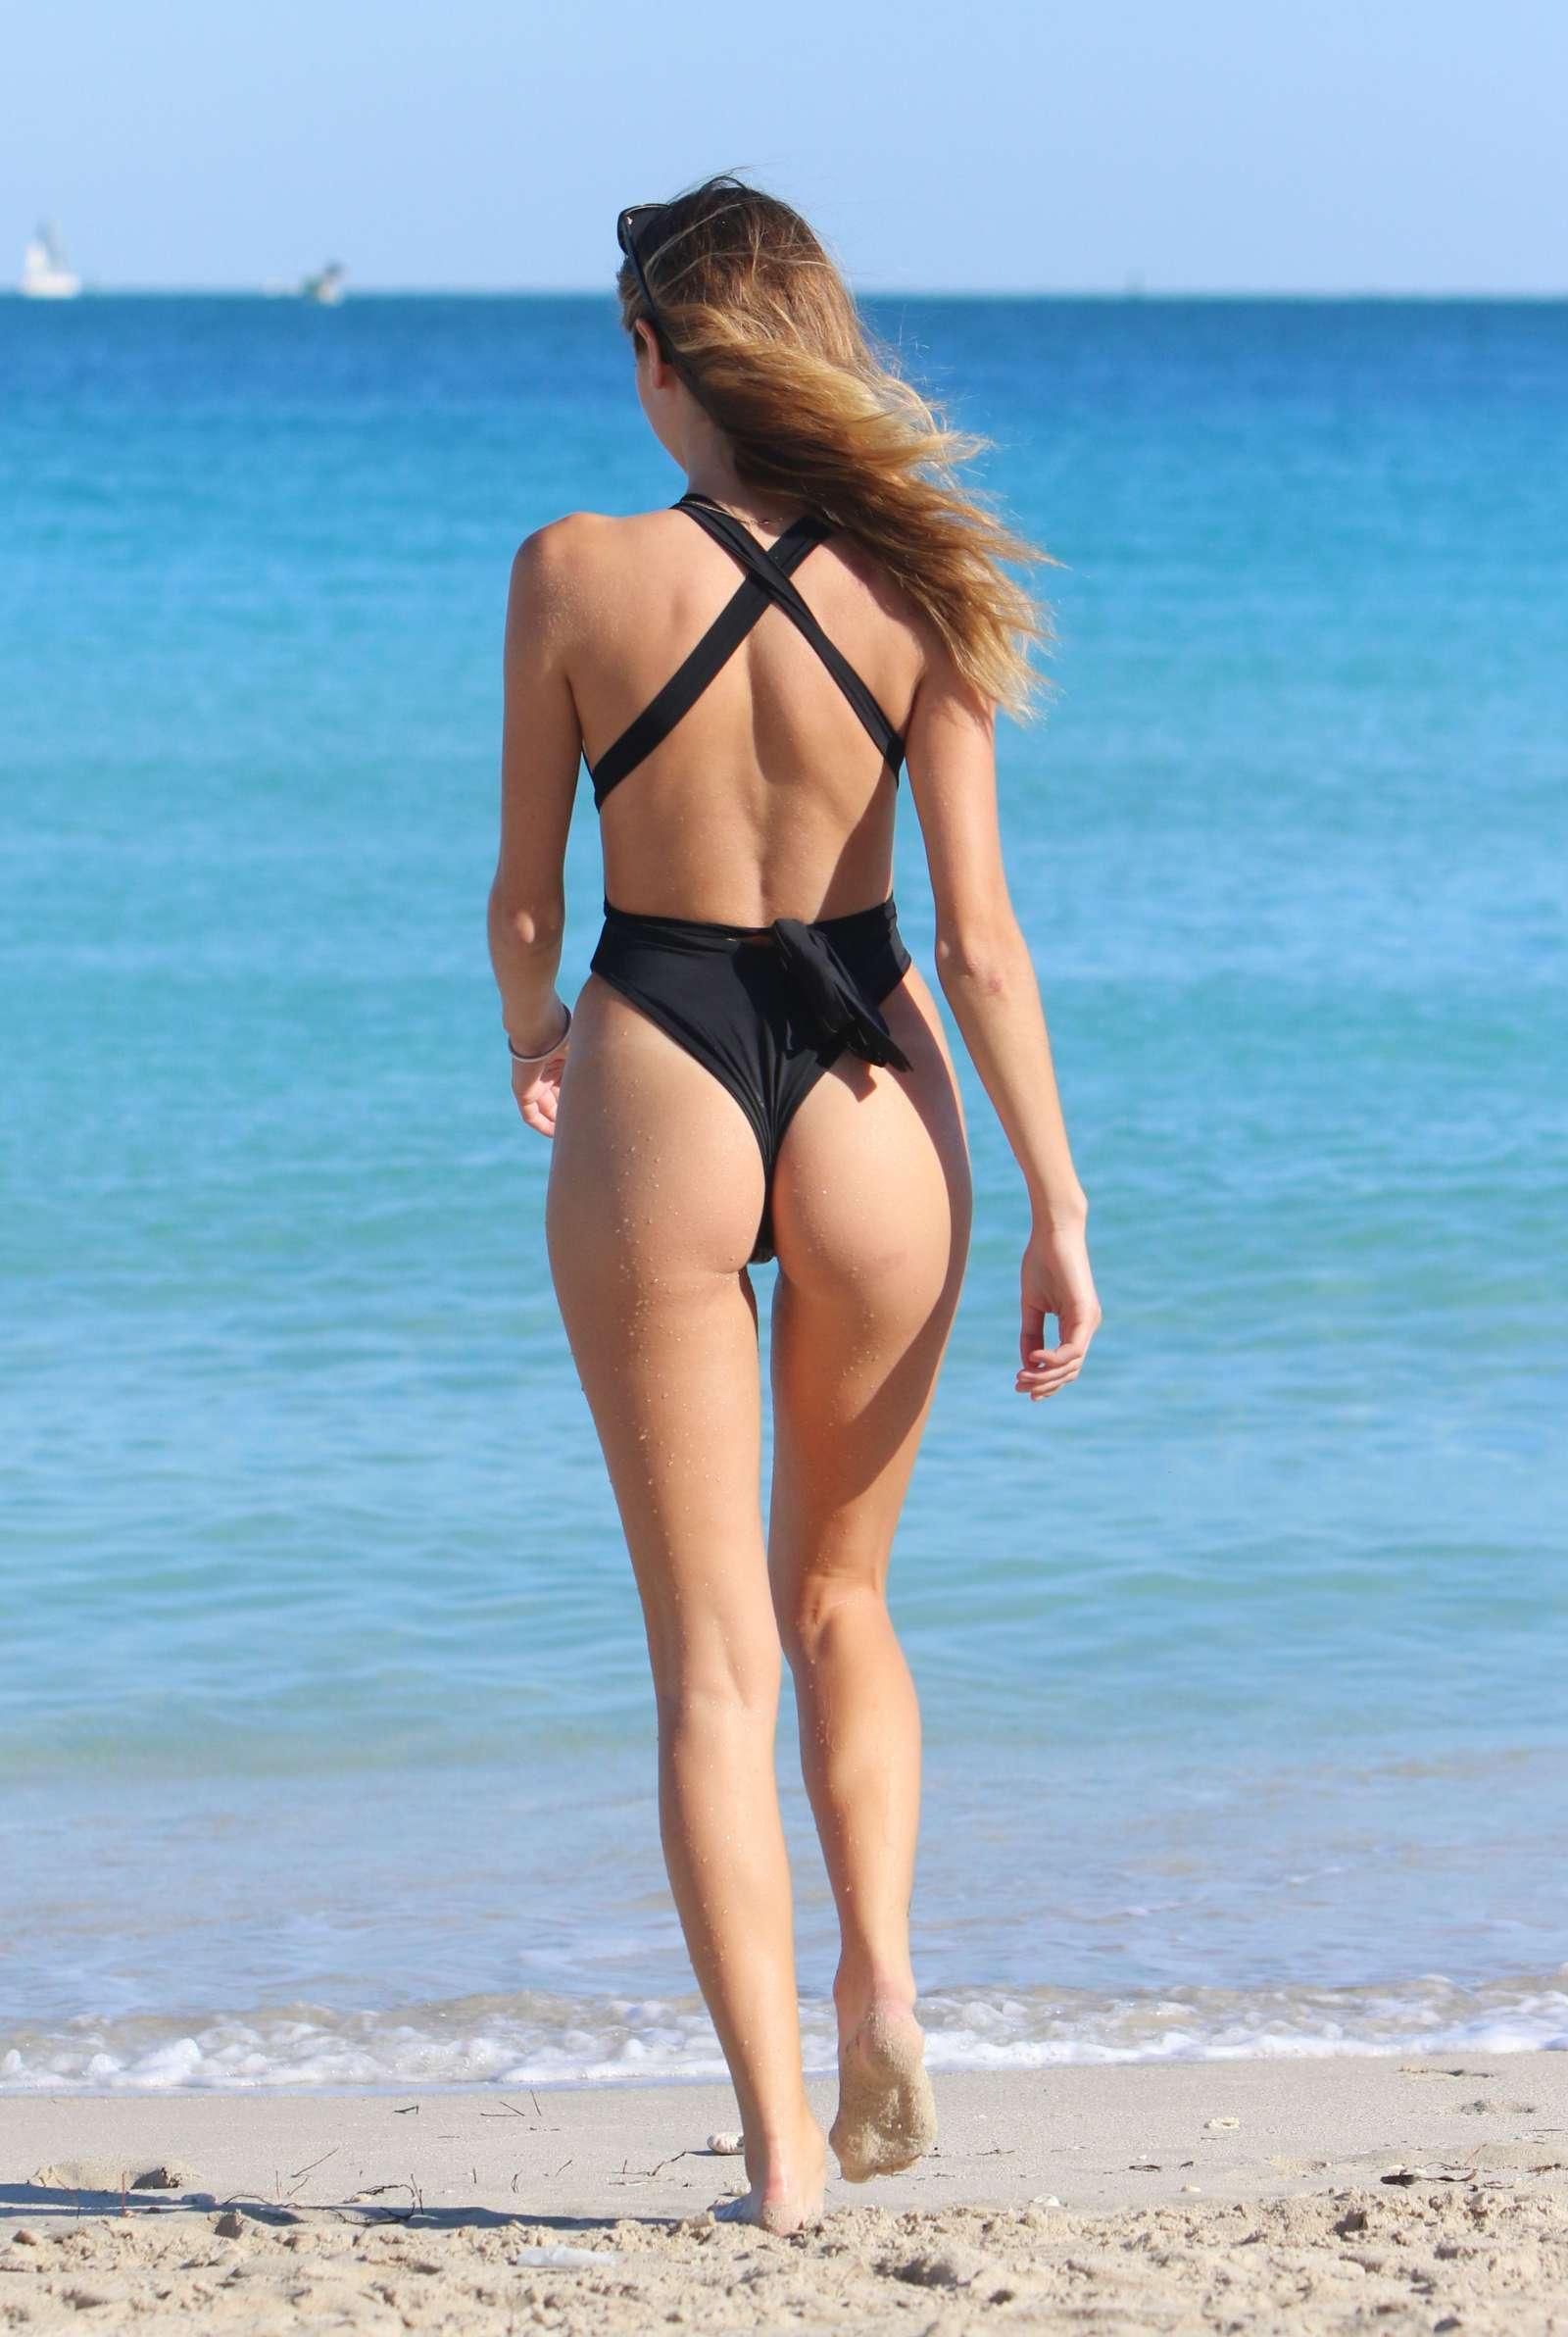 Bikini Jacquelyn Noelle naked (16 foto and video), Tits, Bikini, Instagram, braless 2020